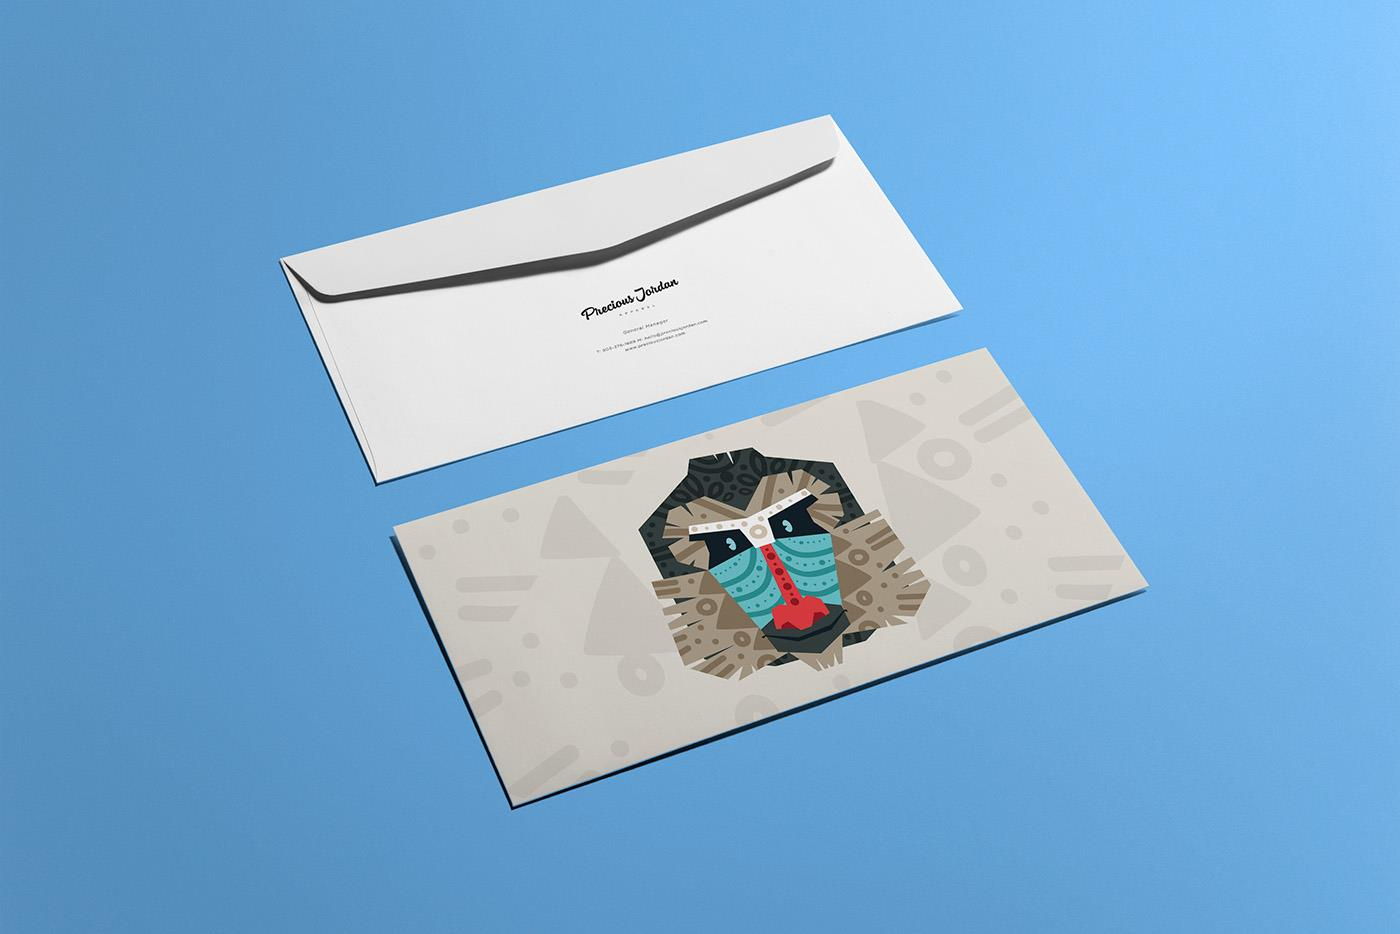 jordan儿童服装品牌形象设计